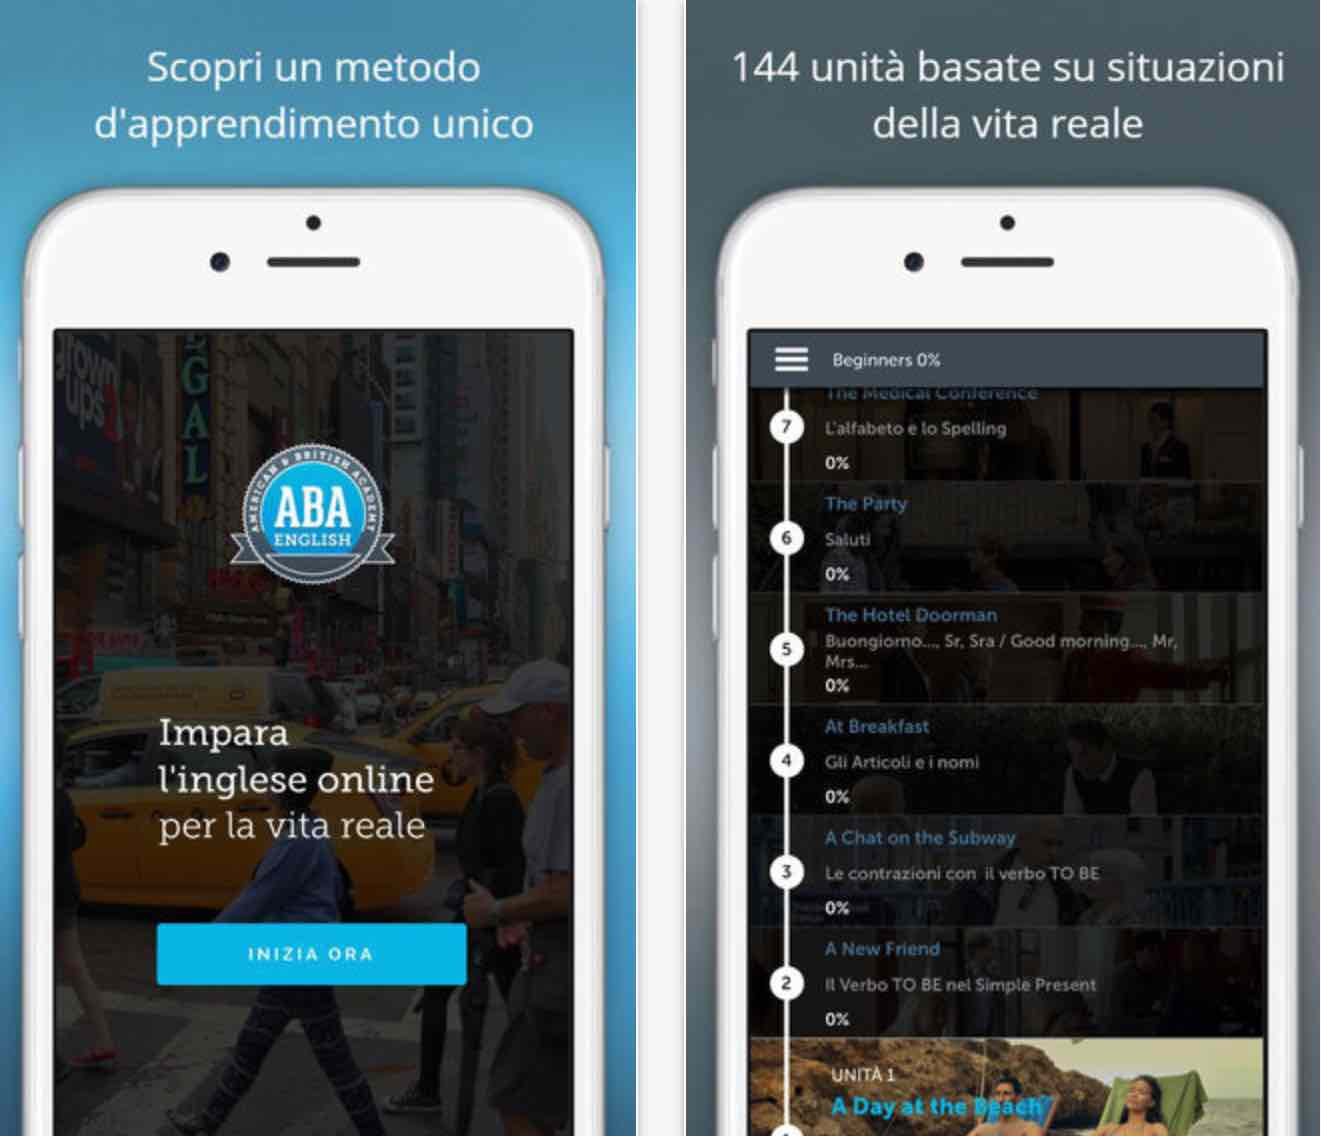 Aba english l 39 app per imparare l 39 inglese su iphone for Cuffie antirumore per studiare